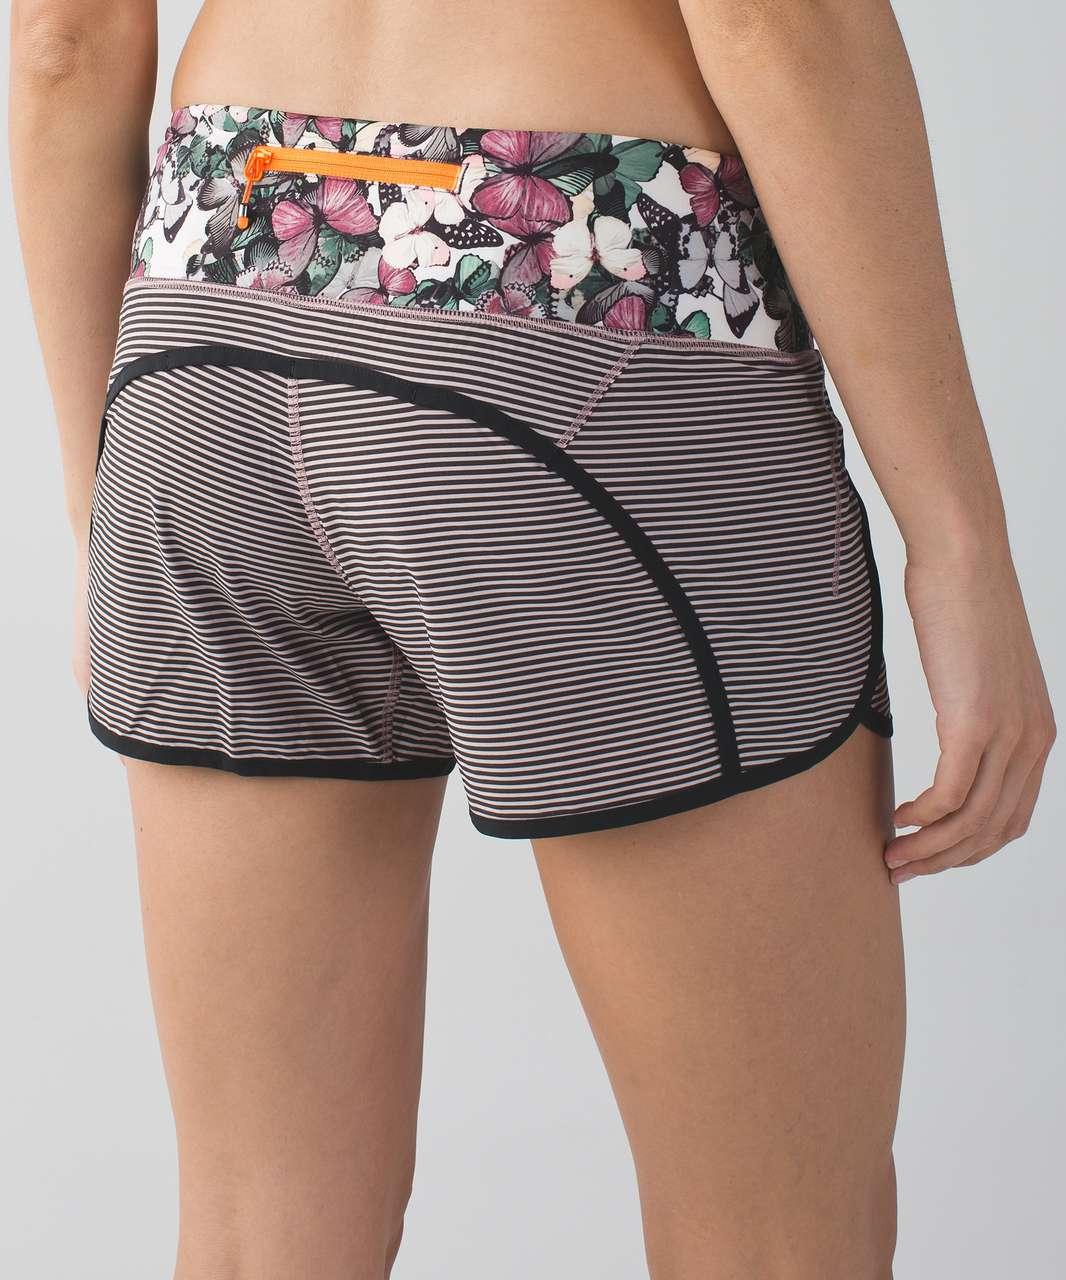 "Lululemon Run Times Short 4-way Stretch 4"" - Mini Pop Stripe Printed Mink Berry Black / Black / So Fly Butterfly Angel Wing Multi"